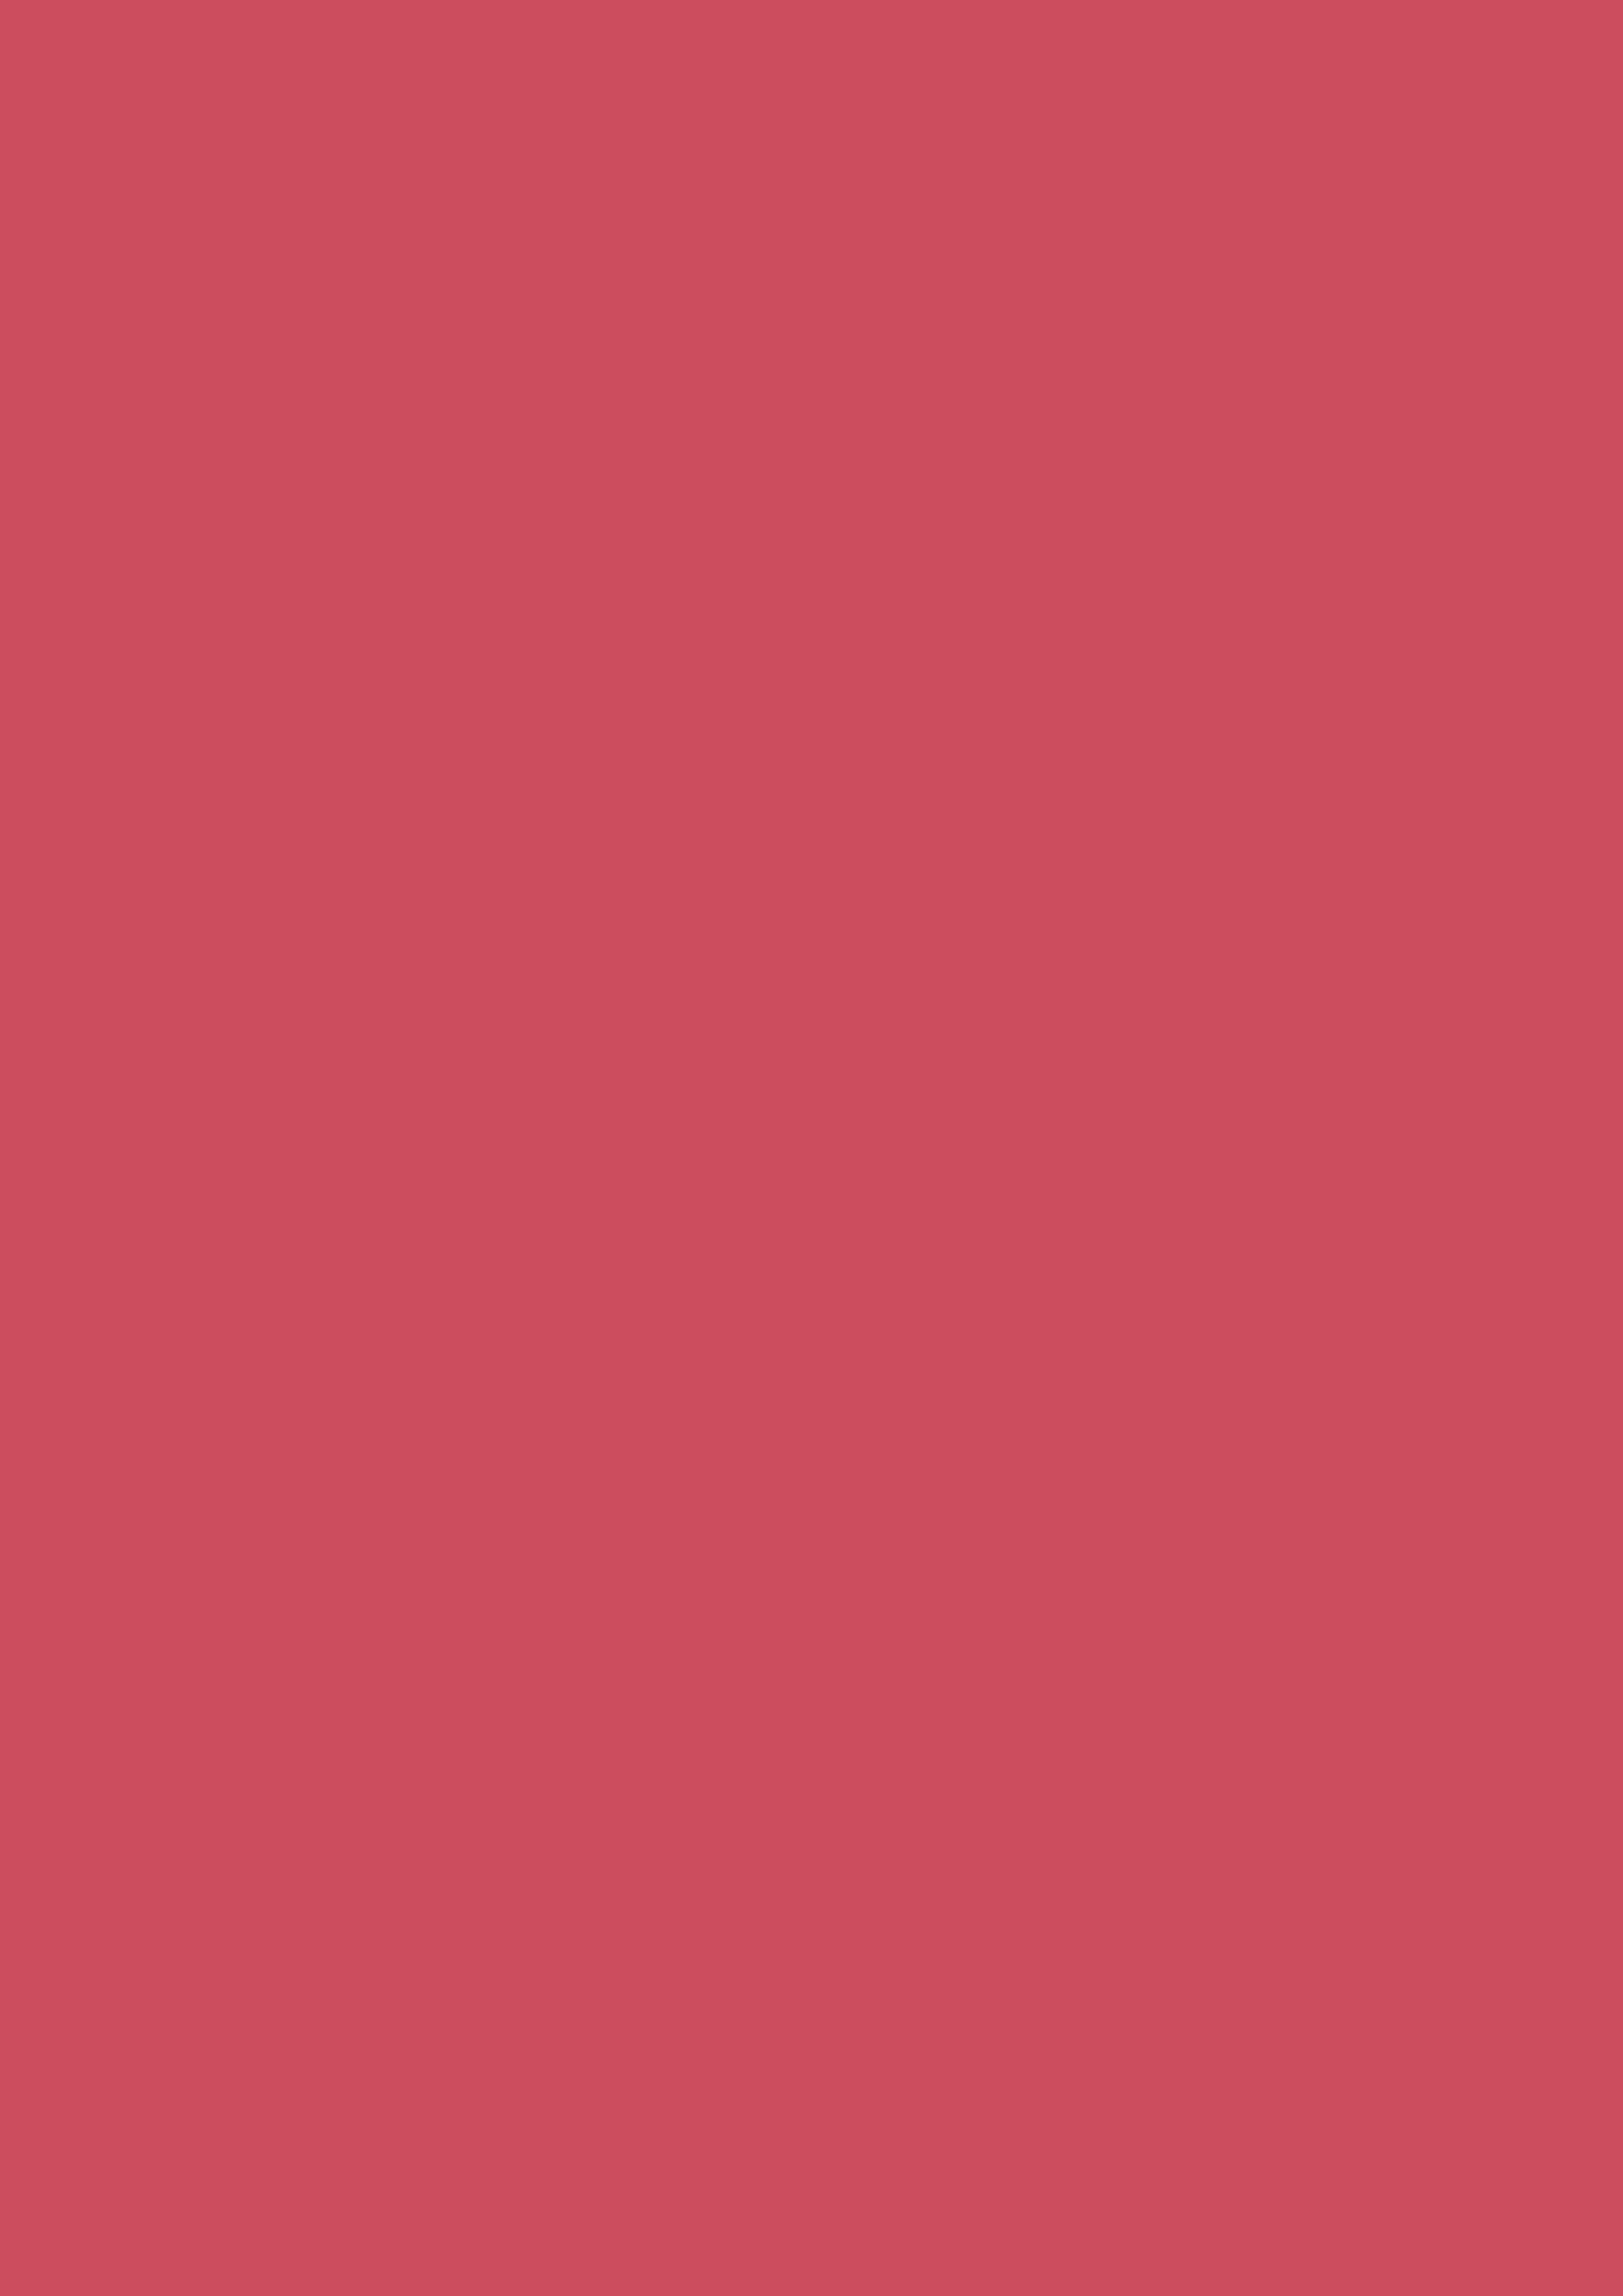 2480x3508 Dark Terra Cotta Solid Color Background